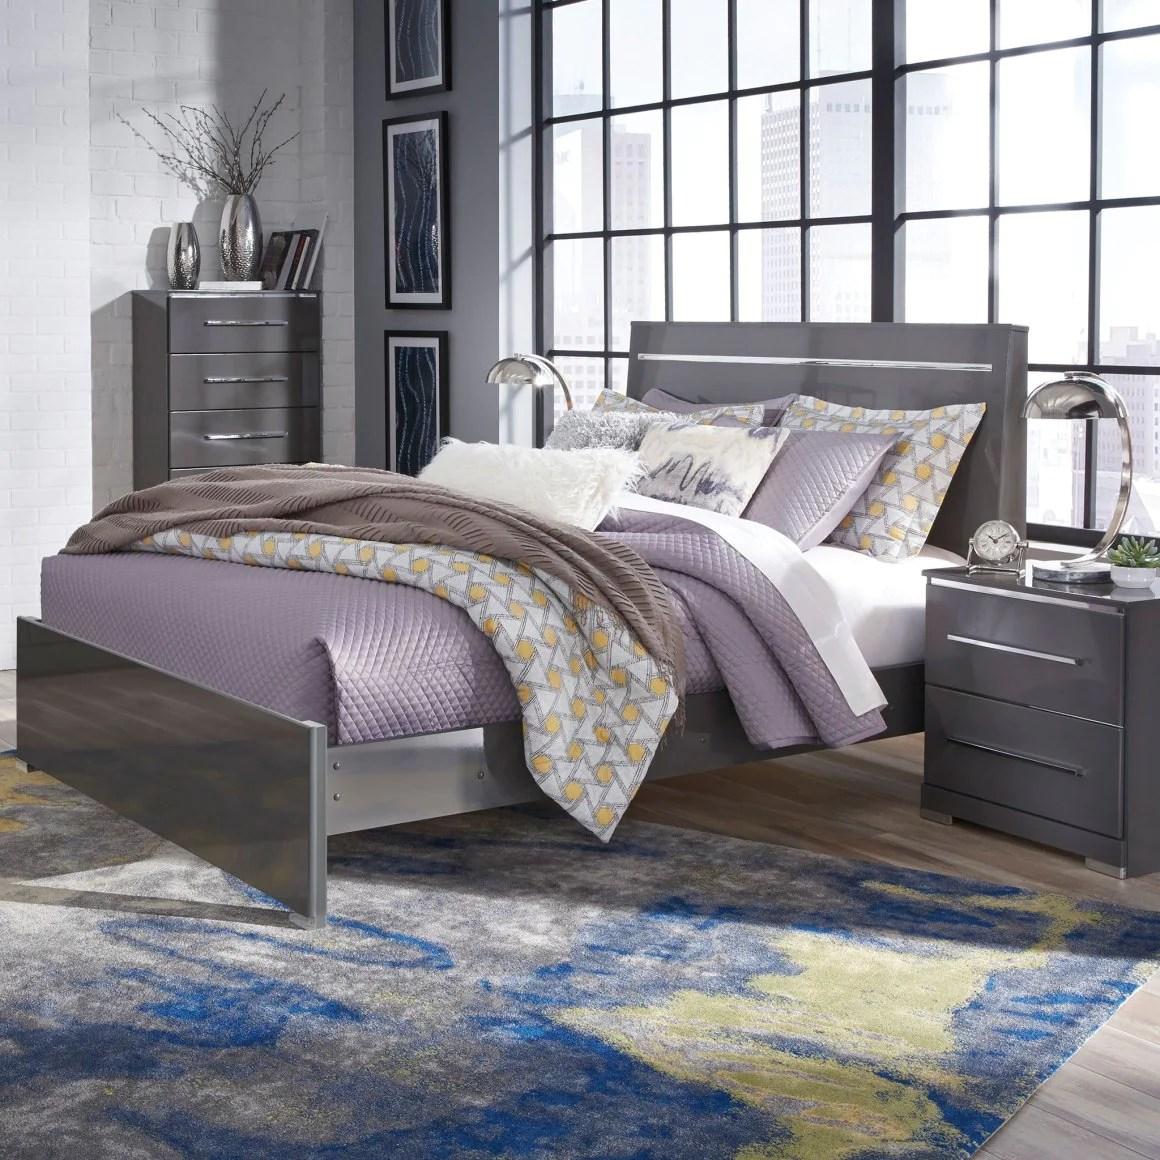 amenajare dormitor minimalist